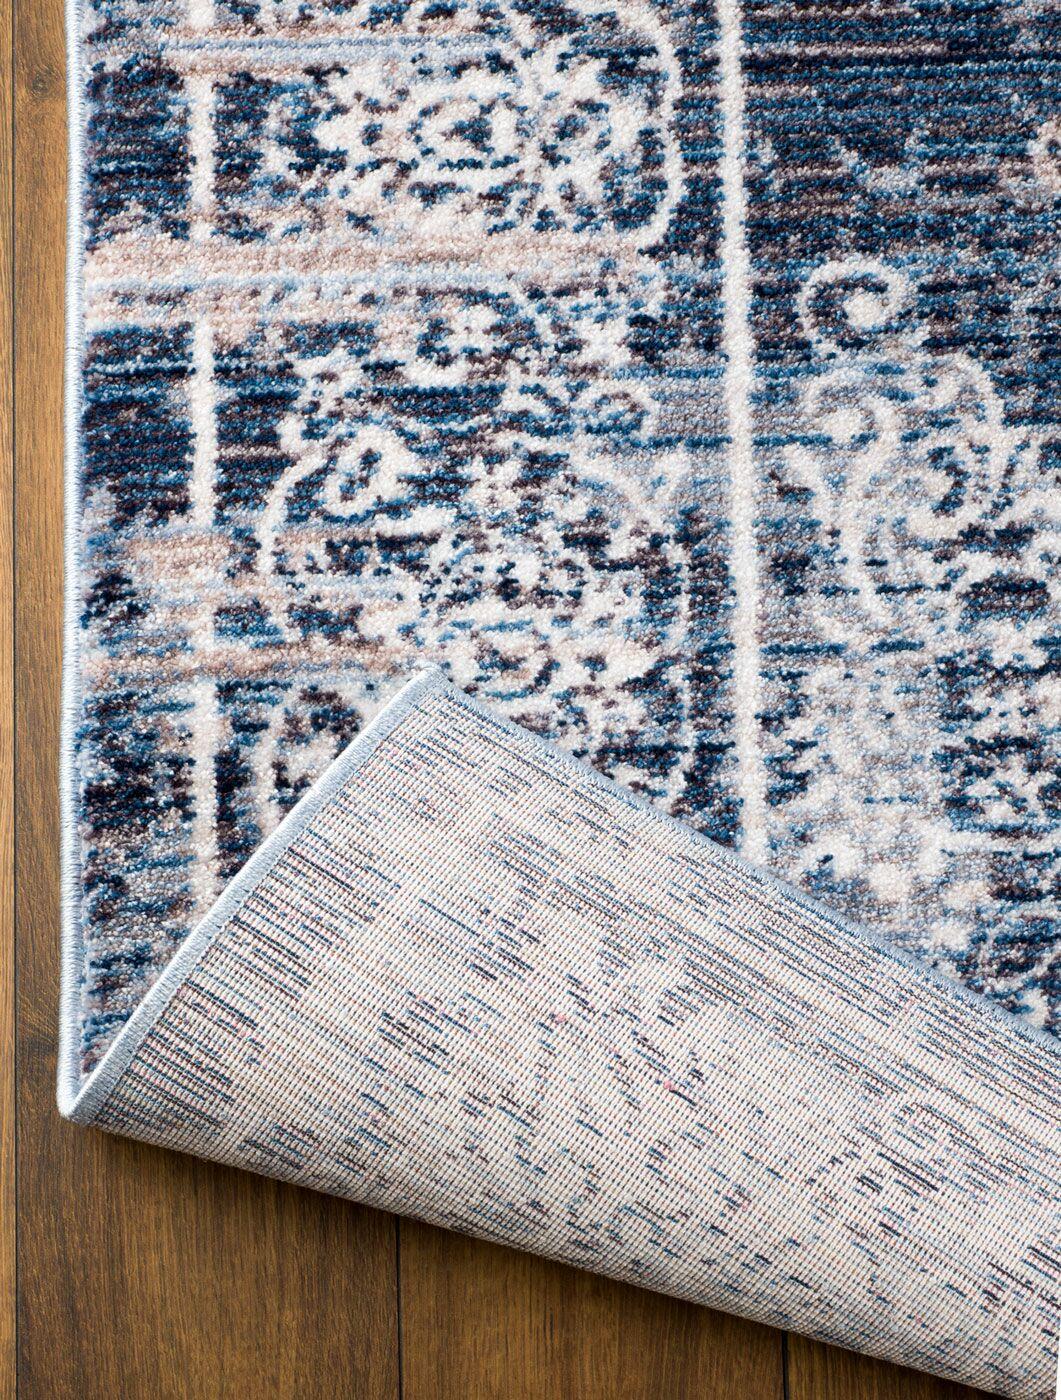 Andrews Blue Area Rug Rug Size: Rectangle 7'11